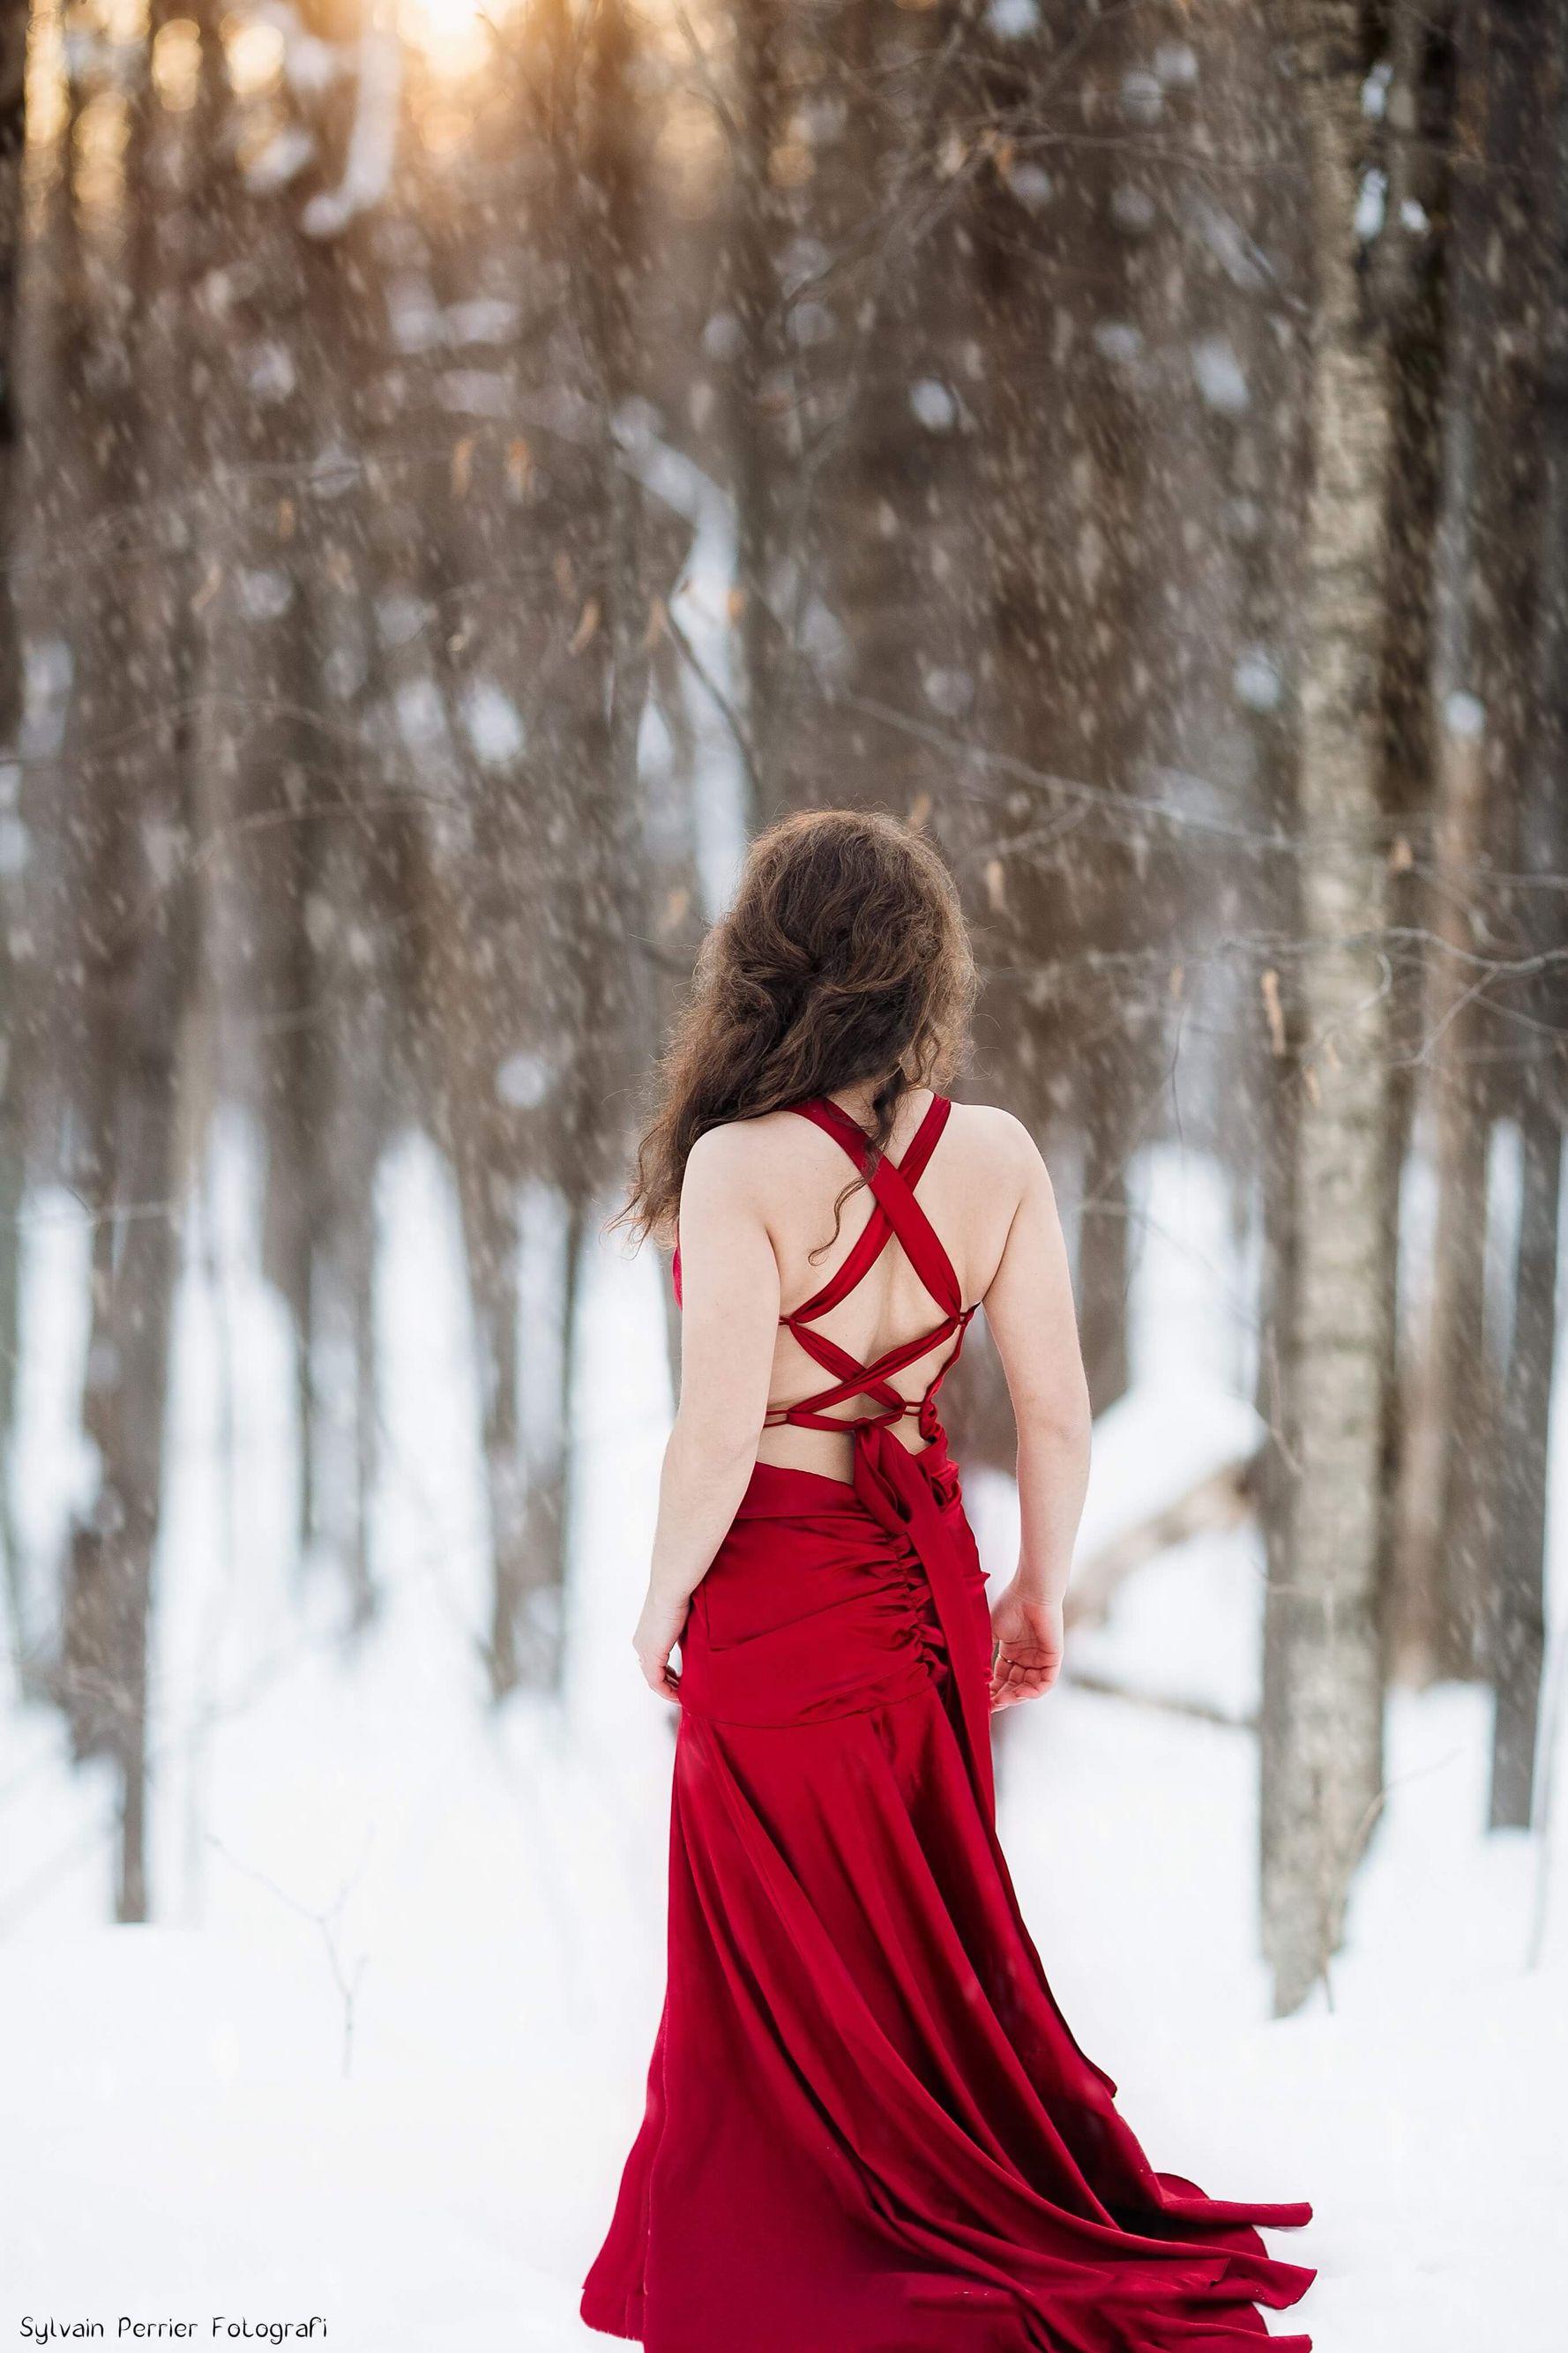 Photoshoot model in winter Beautiful woman in red dress